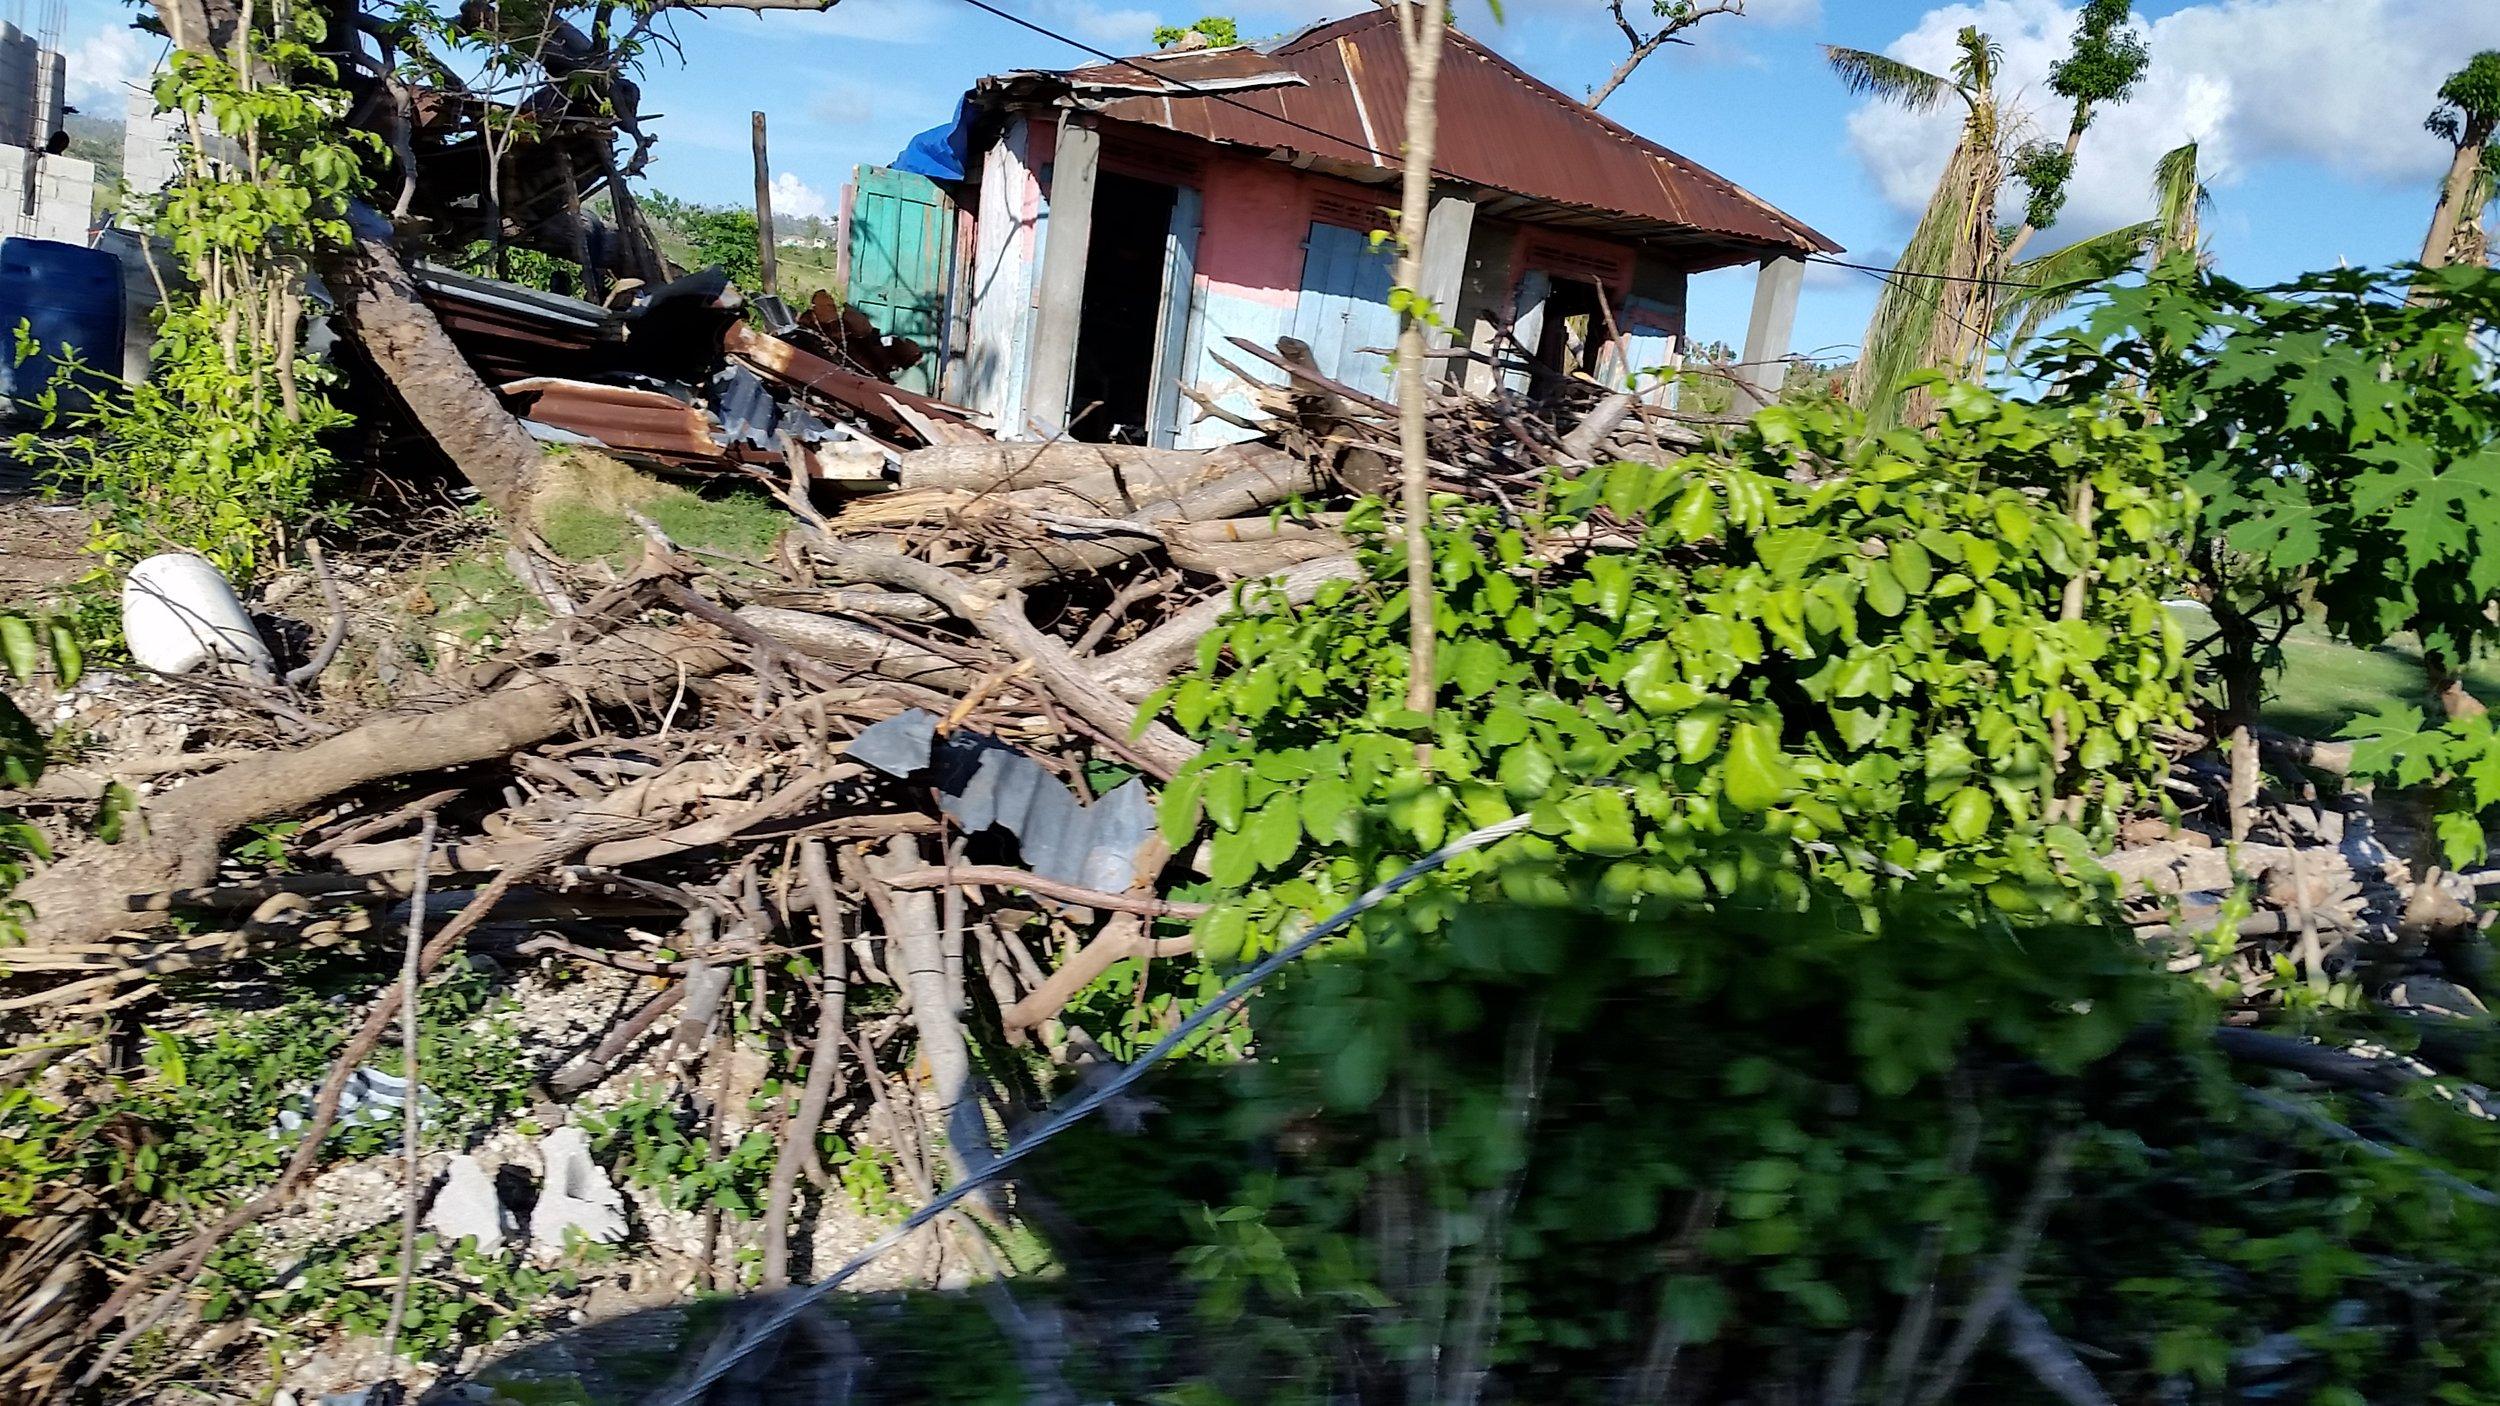 Damaged houses, debris everywhere, power lines down.